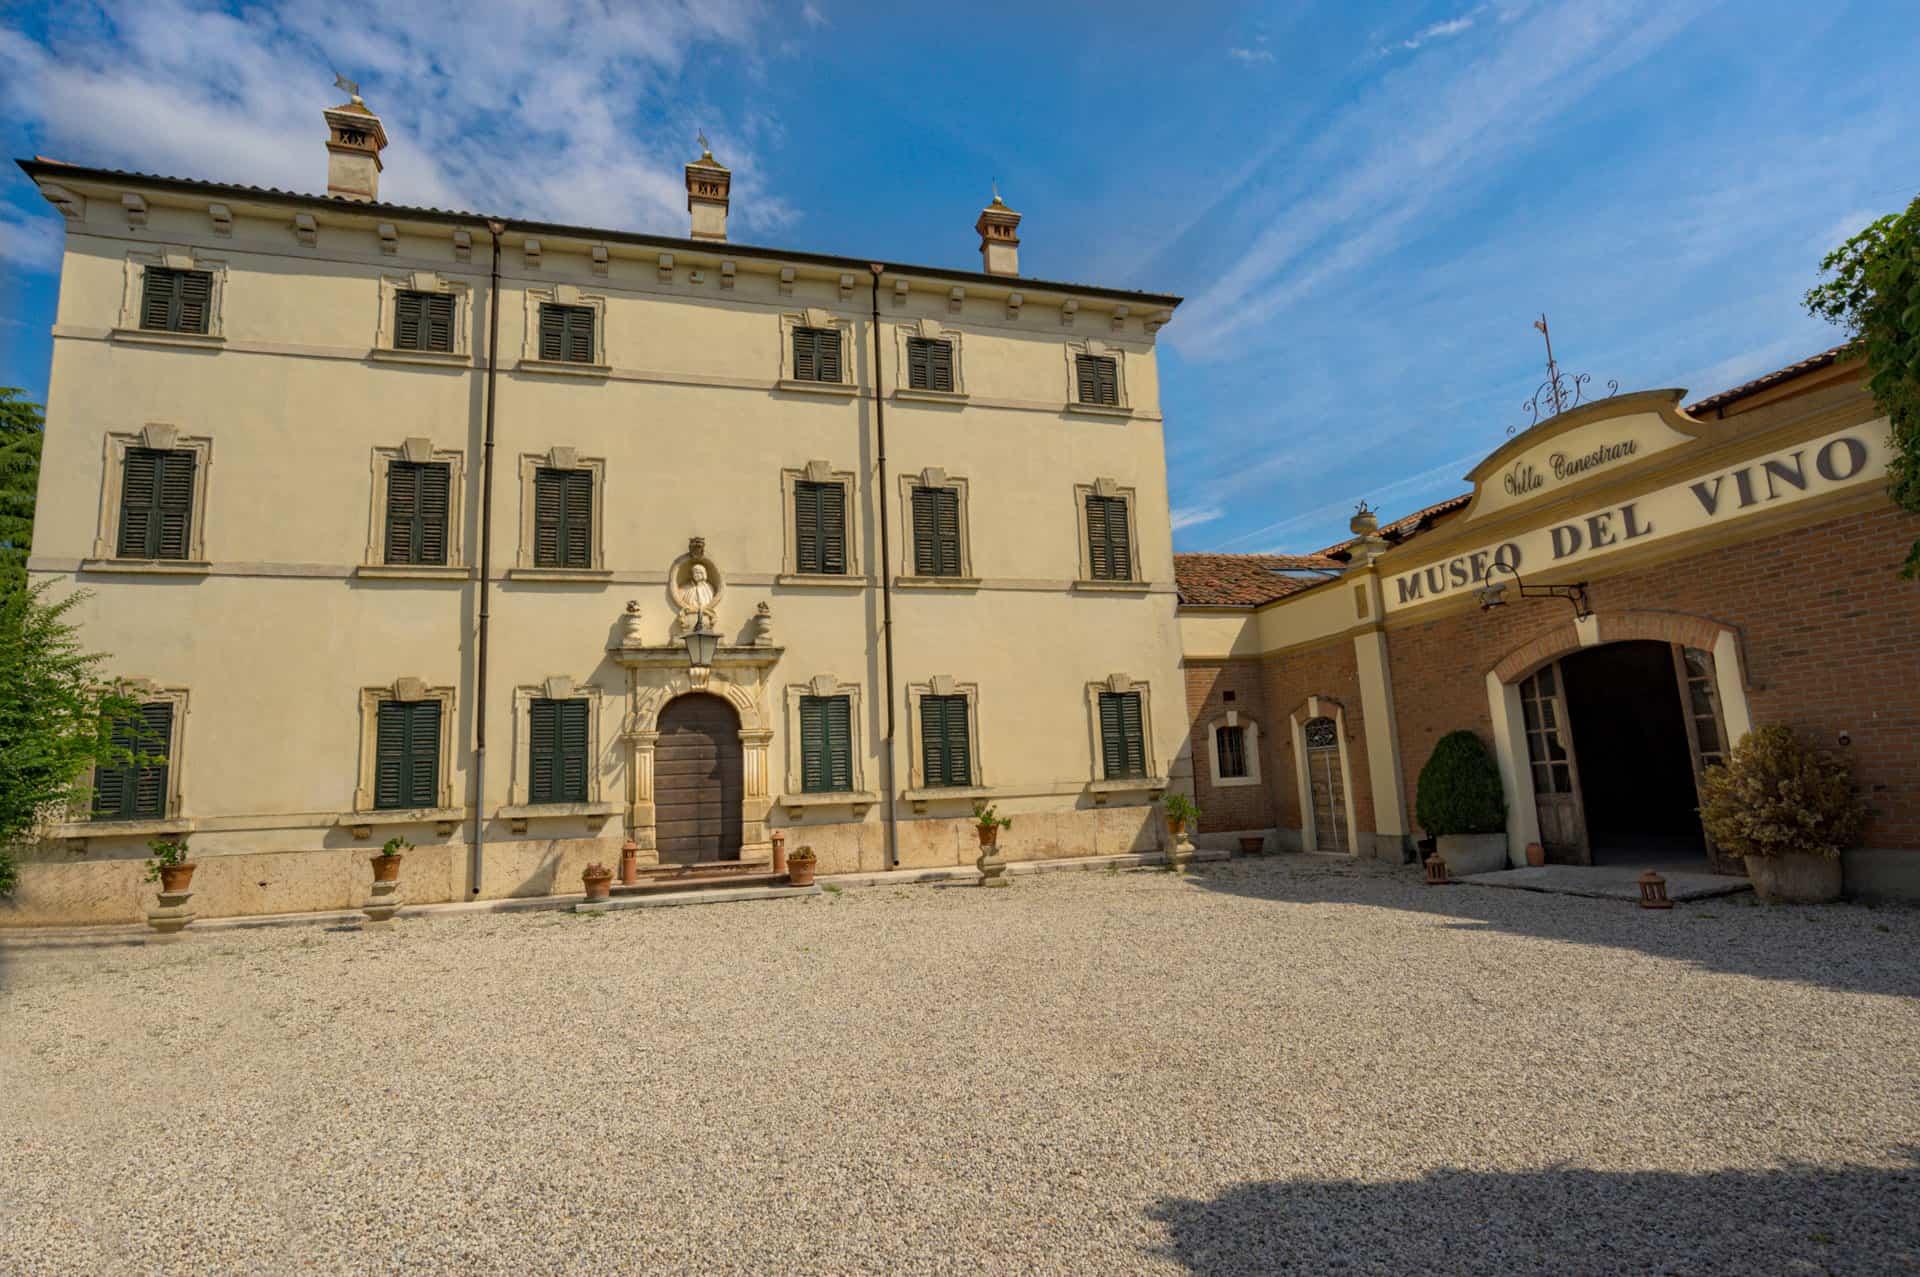 museo del vino verona villa canestrari panoramica